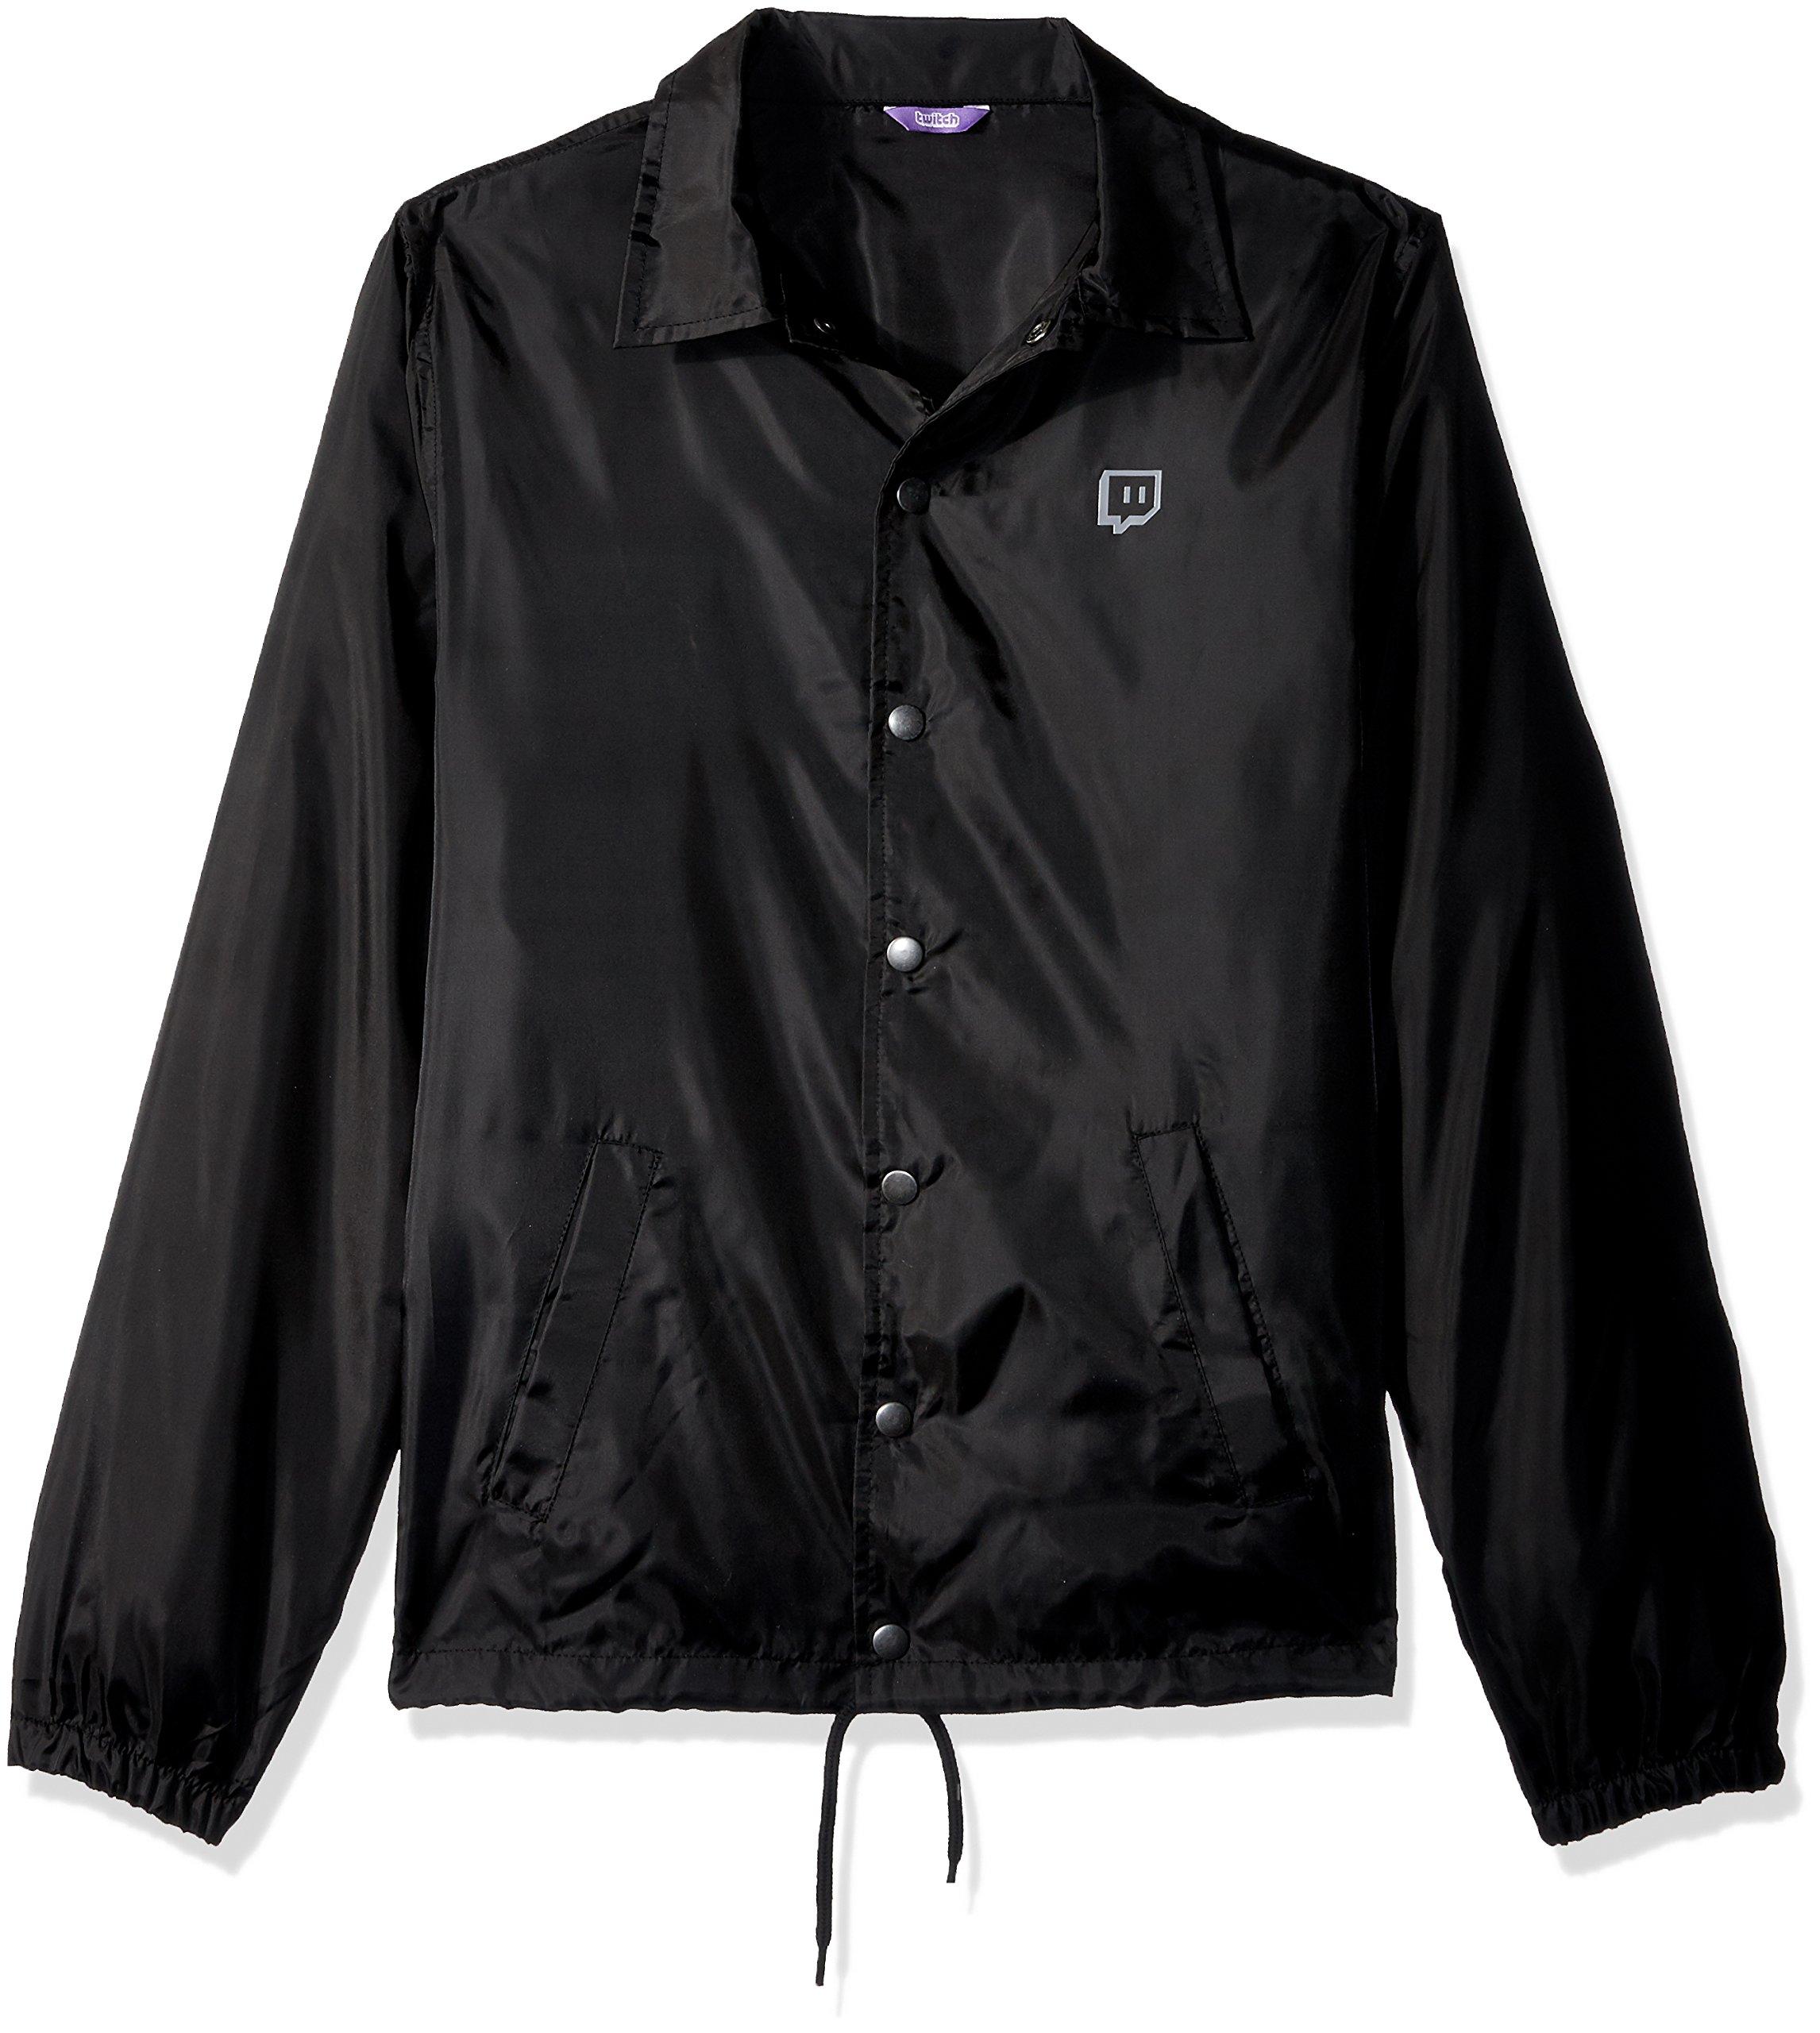 Twitch Cut Logo Coaches Jacket (Small) by Twitch